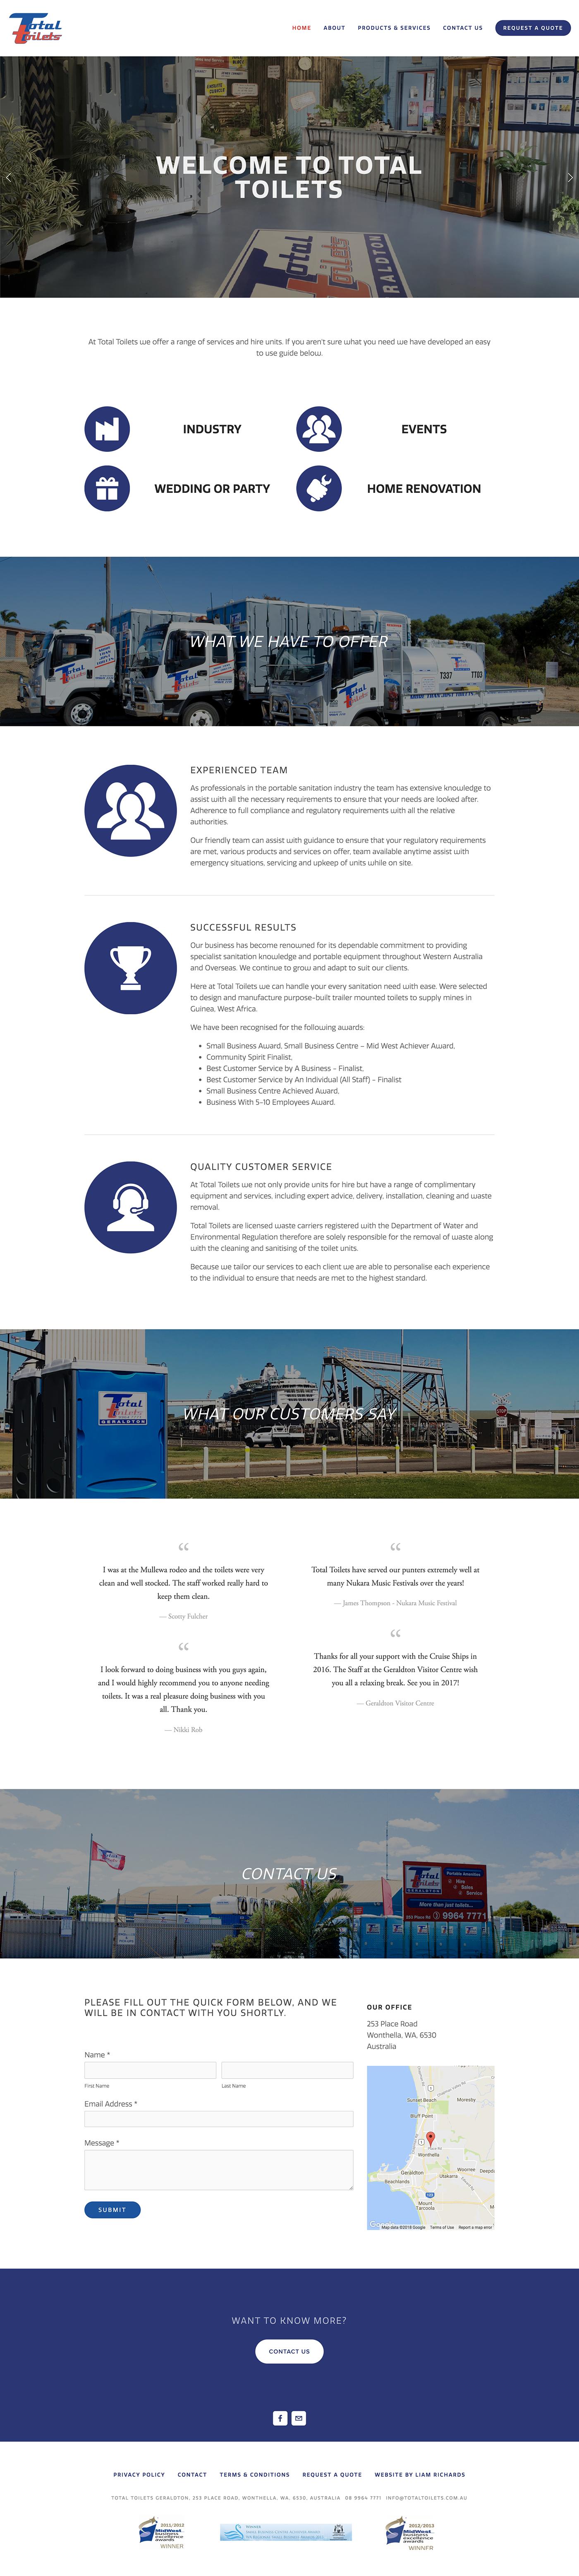 Total Toilets Website on Behance